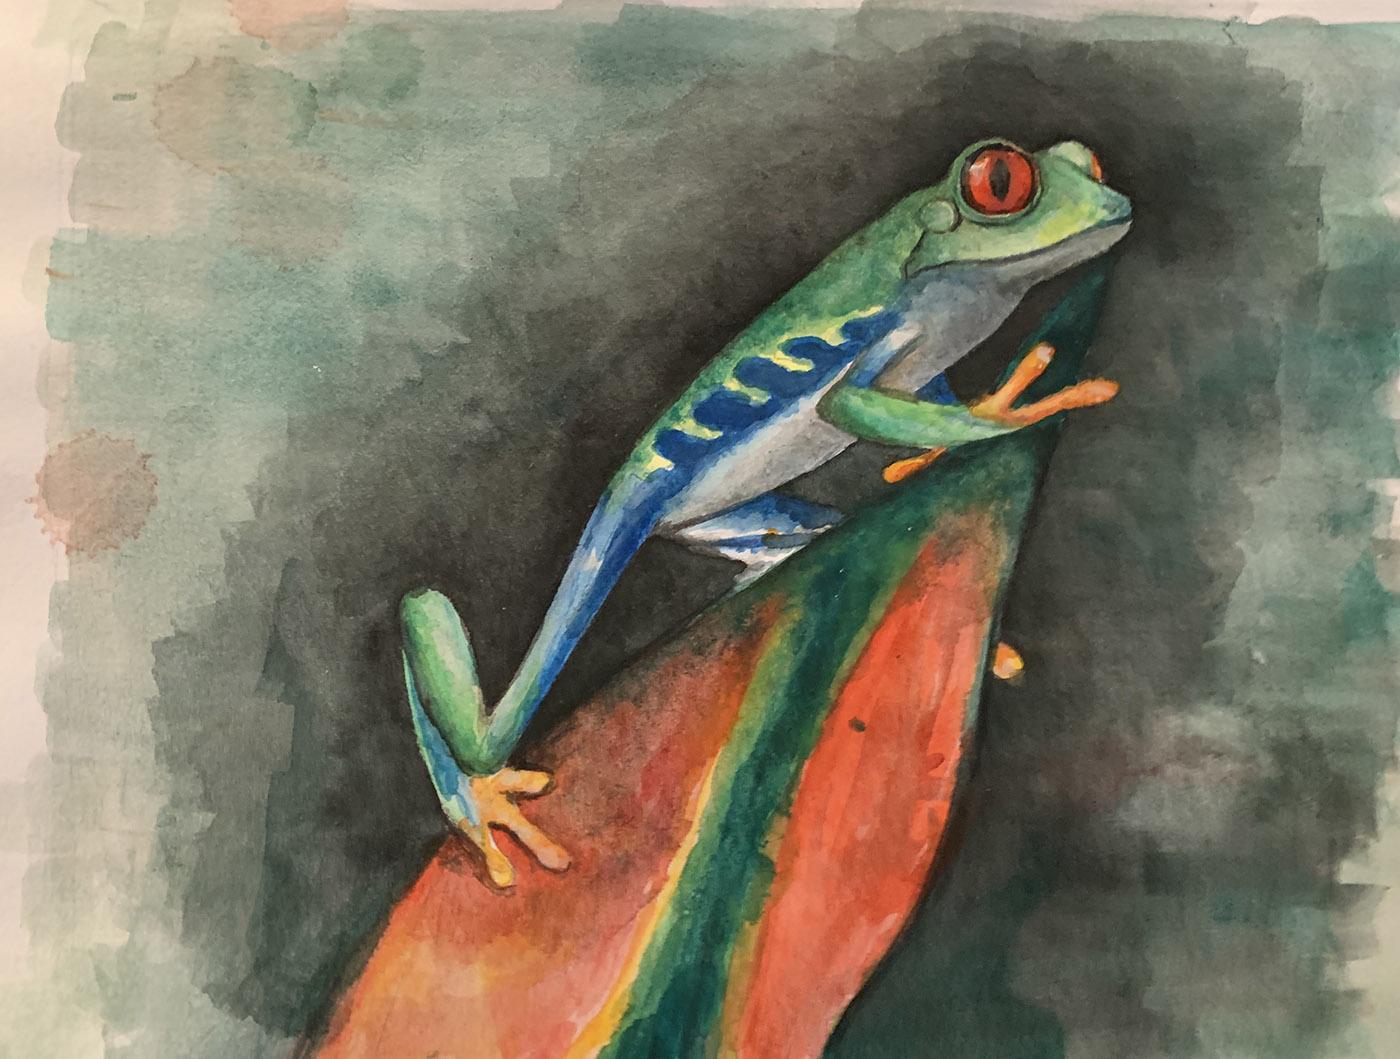 Logan-Rance-Frog-Art-Red-Eyed-Treefrog